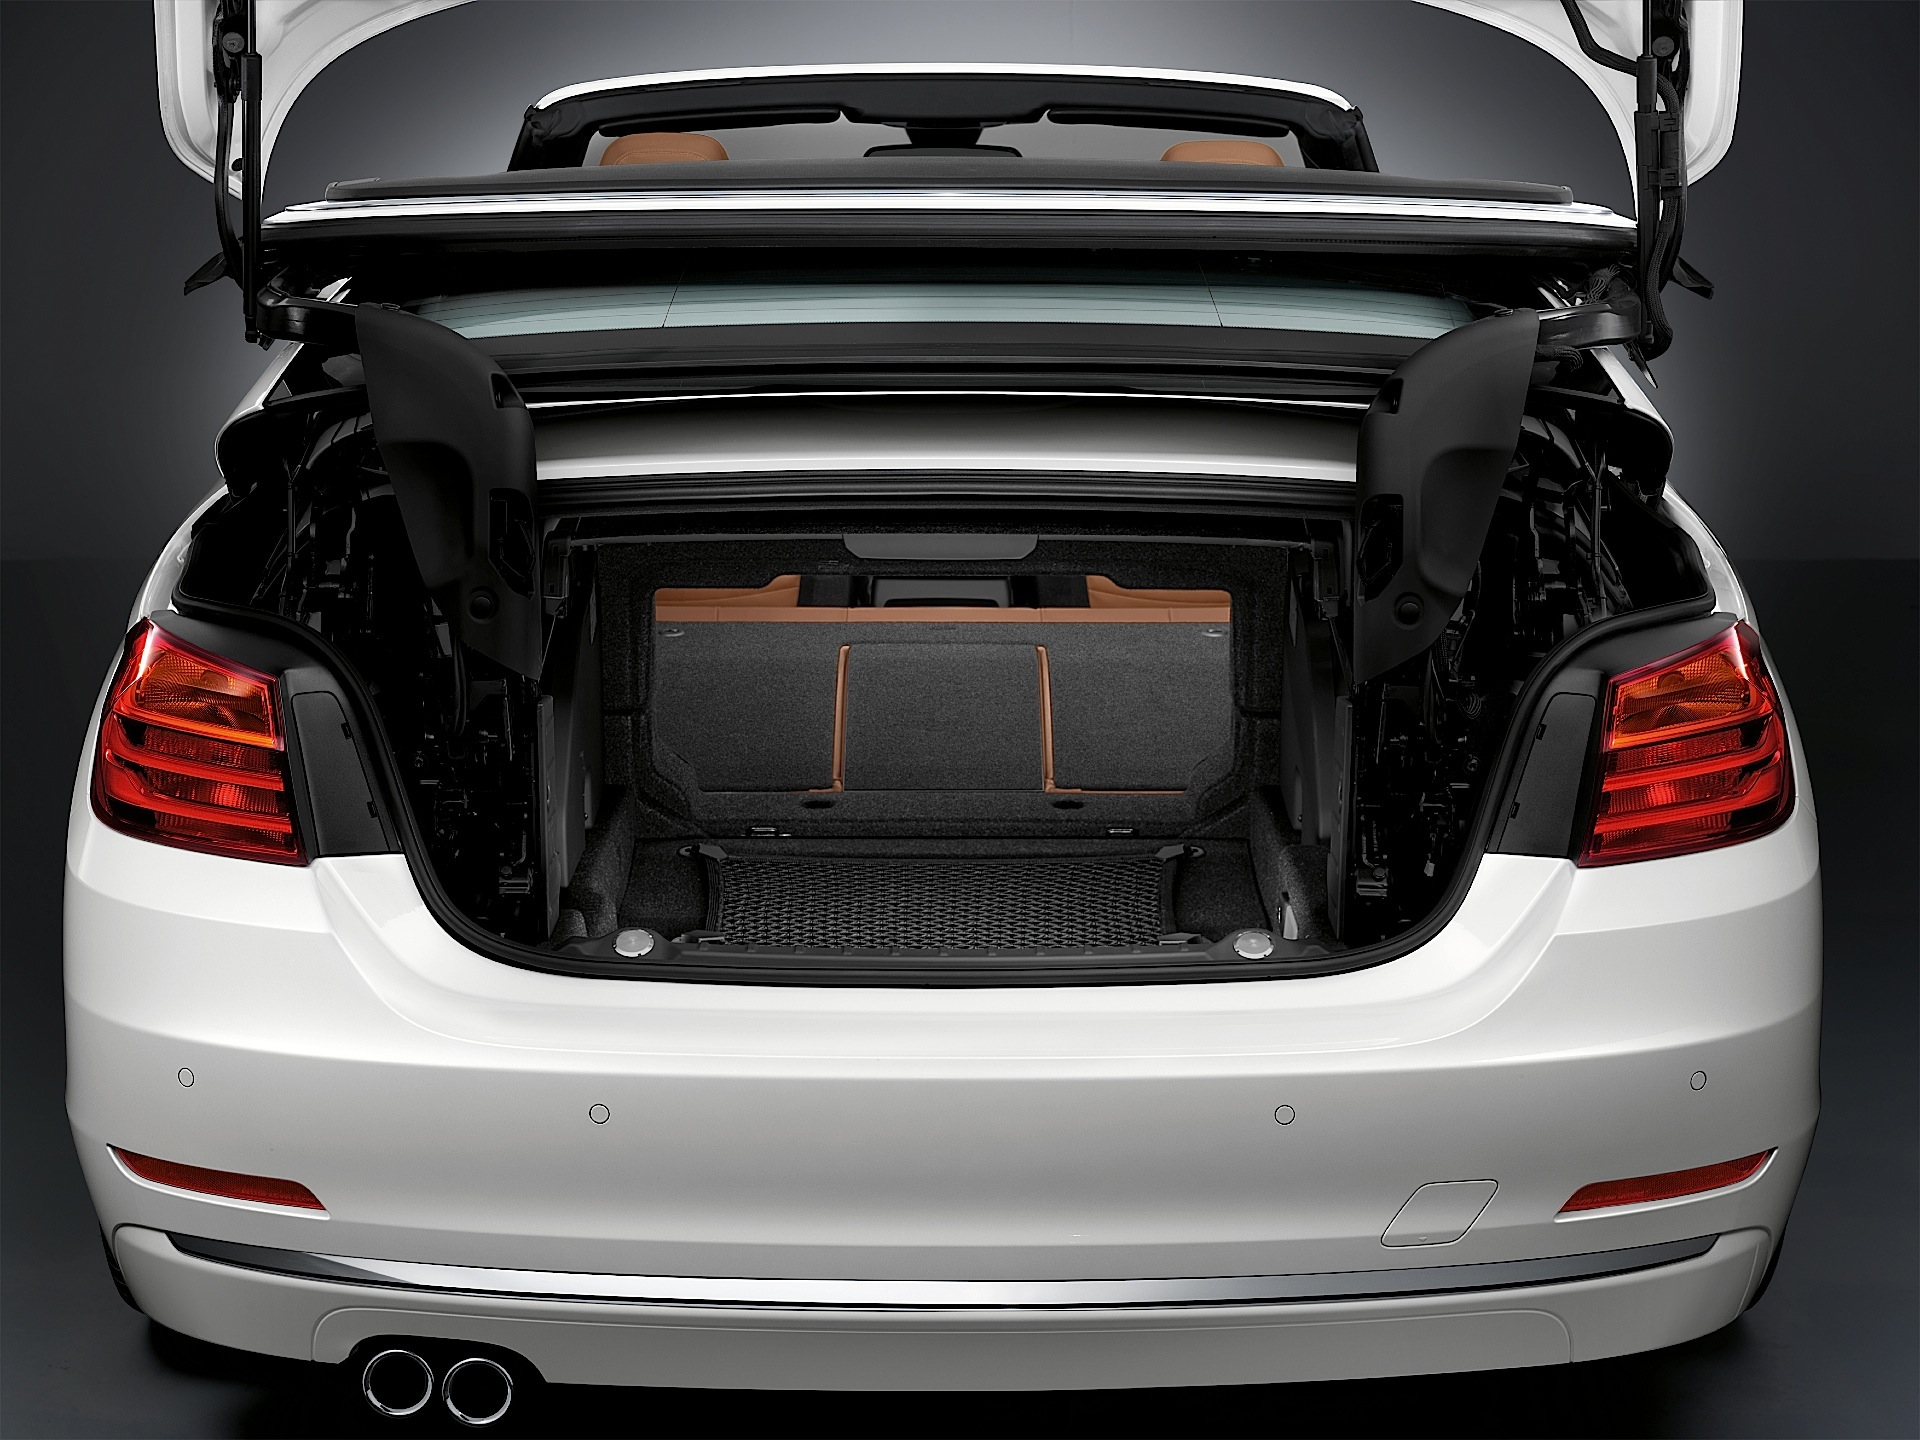 bmw 4 series cabrio specs 2014 2015 2016 2017 2018 autoevolution. Black Bedroom Furniture Sets. Home Design Ideas